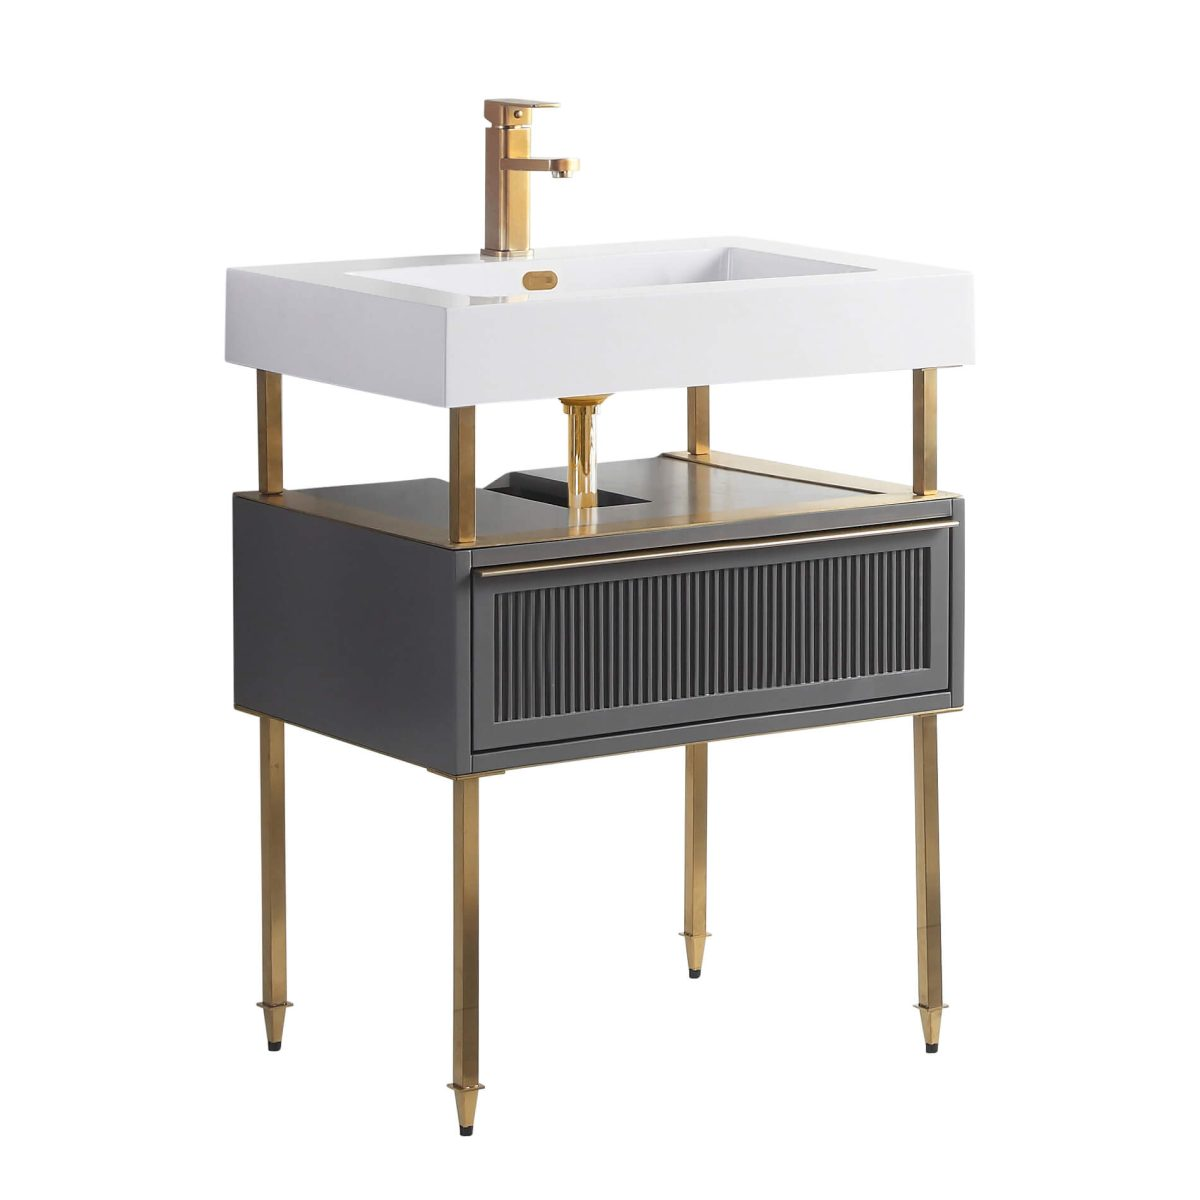 "Dakota 30"" Modern Bathroom Vanity  Rock Gray with Satin Brass Hardware"